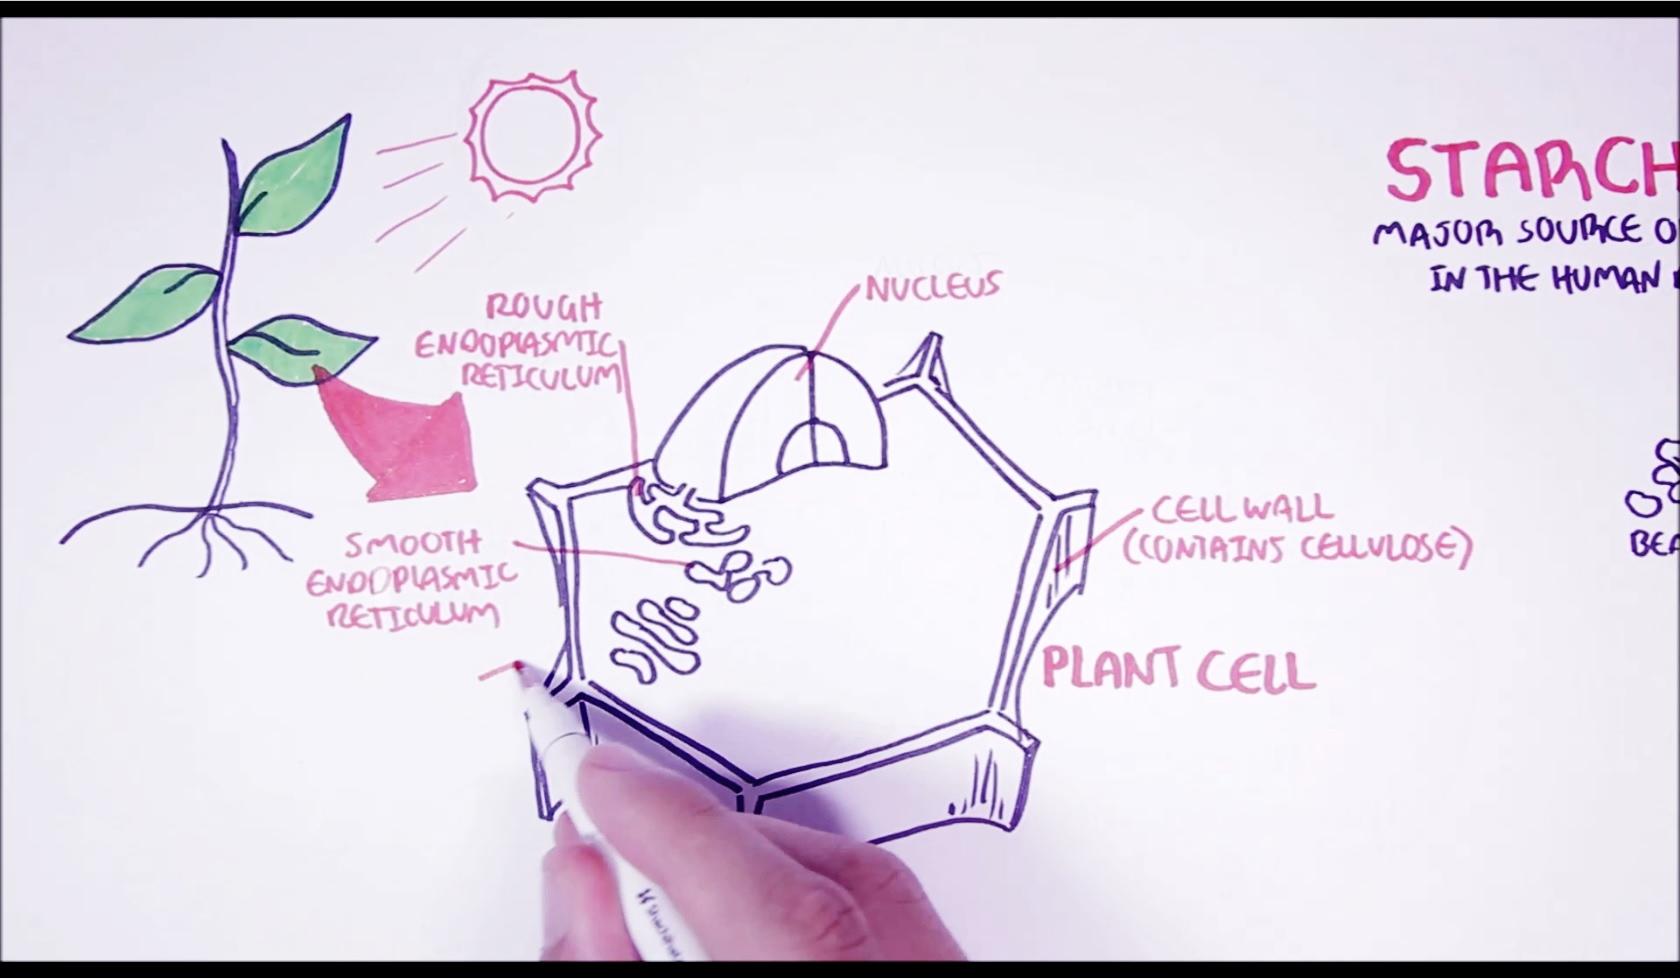 Plants eat sun, plants make giant cell. Simple.